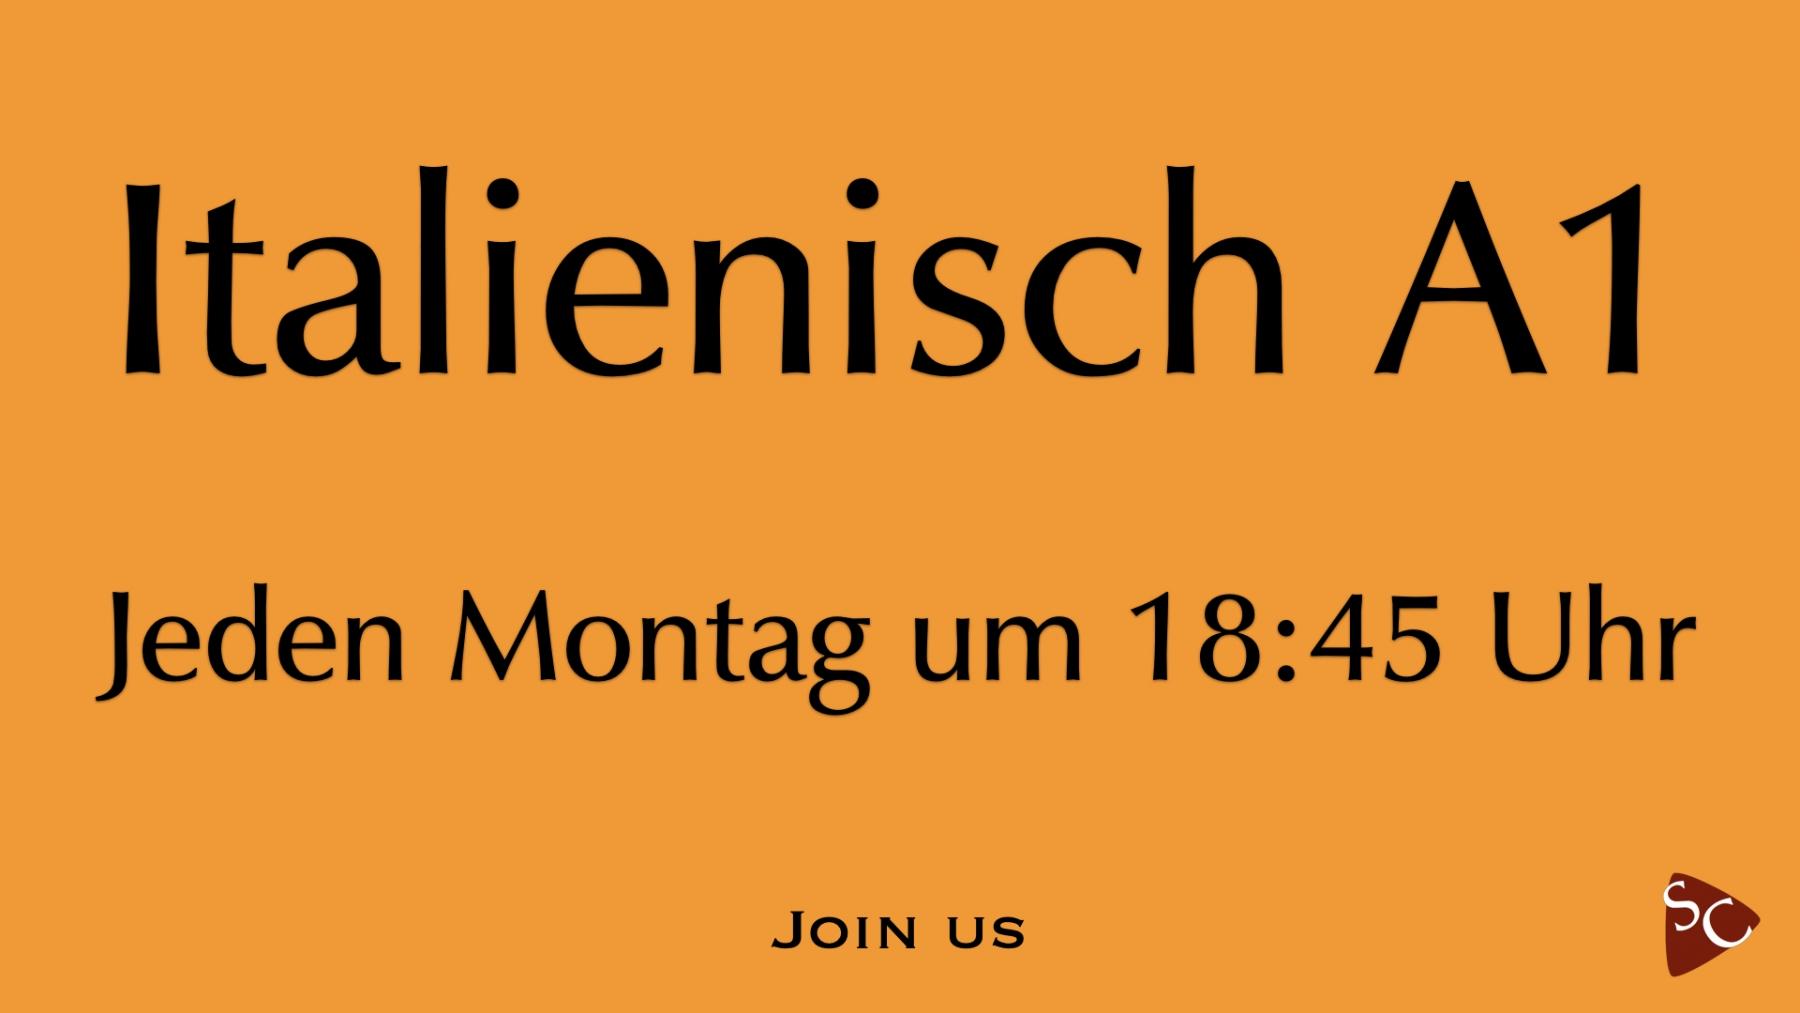 ASCL presentation Stundenplan 20200613.025